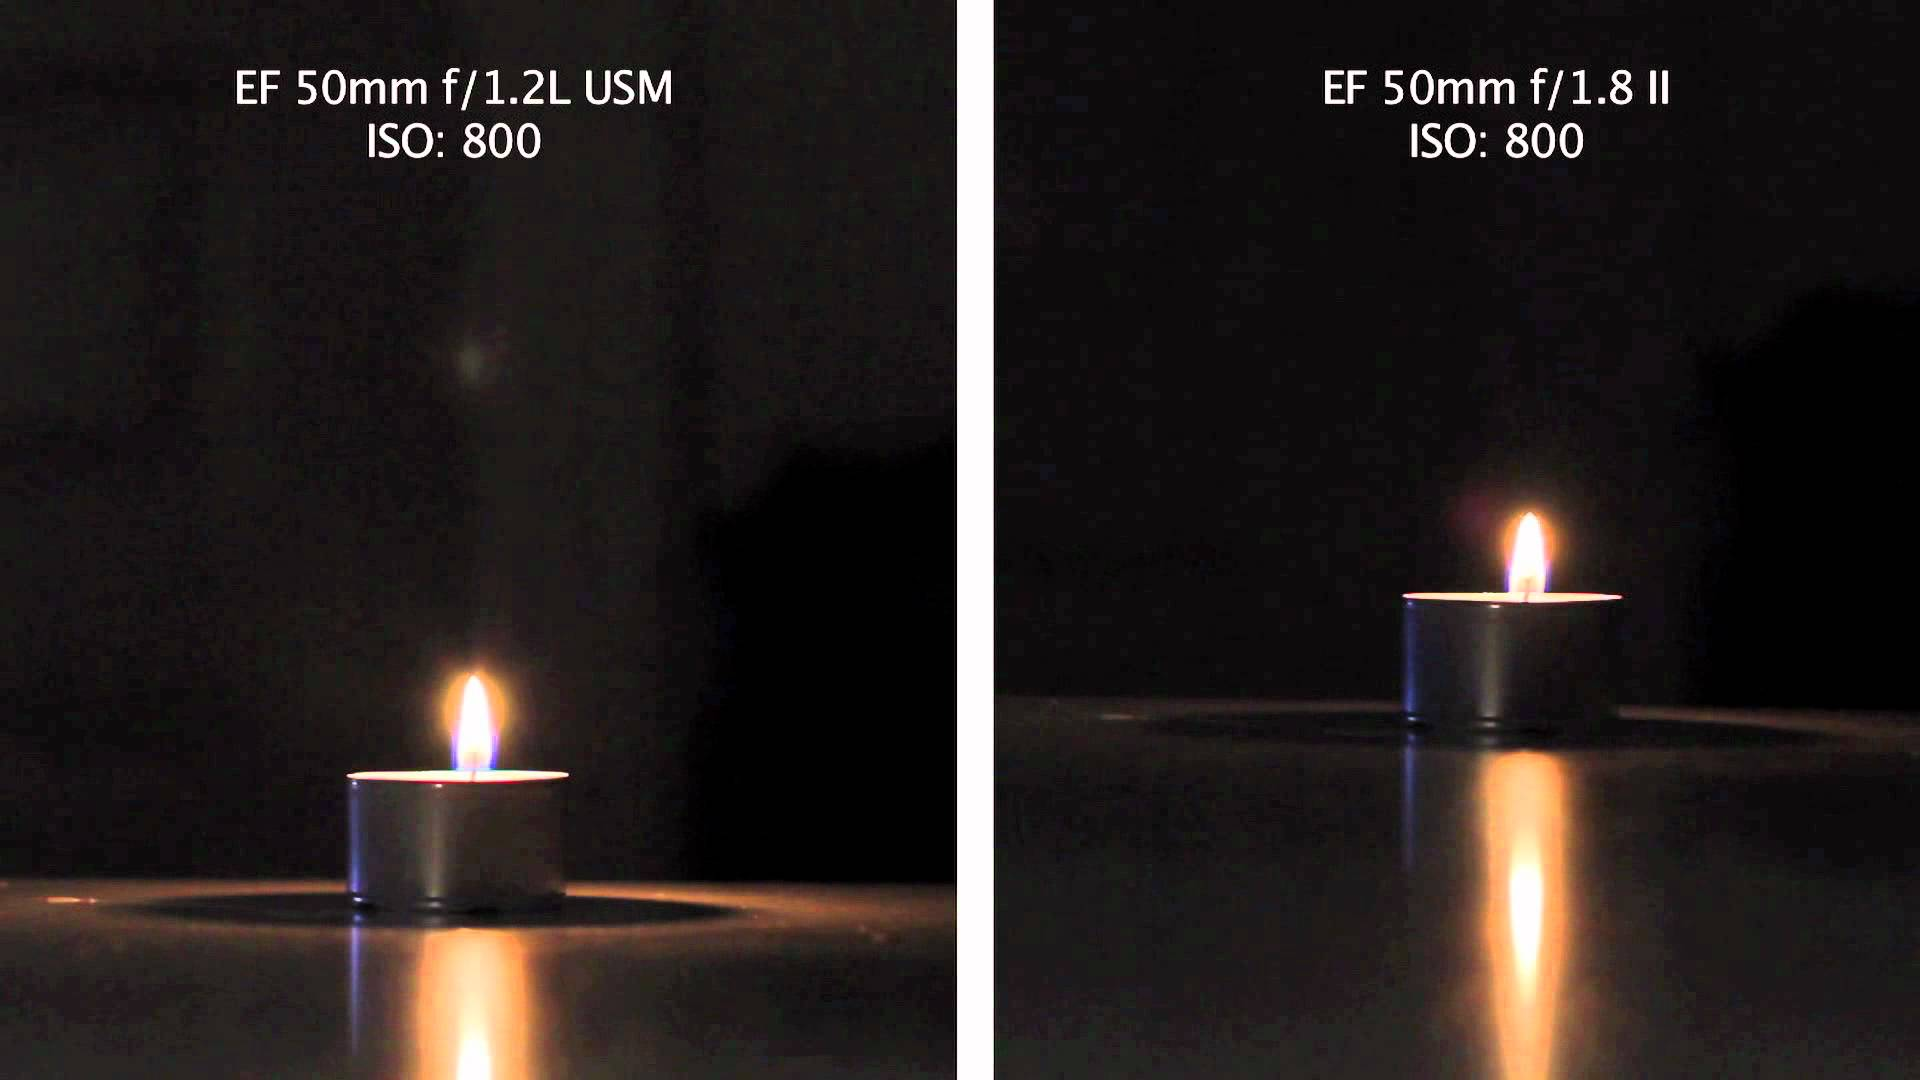 Shot at night Canon 1.2 vs 1.4